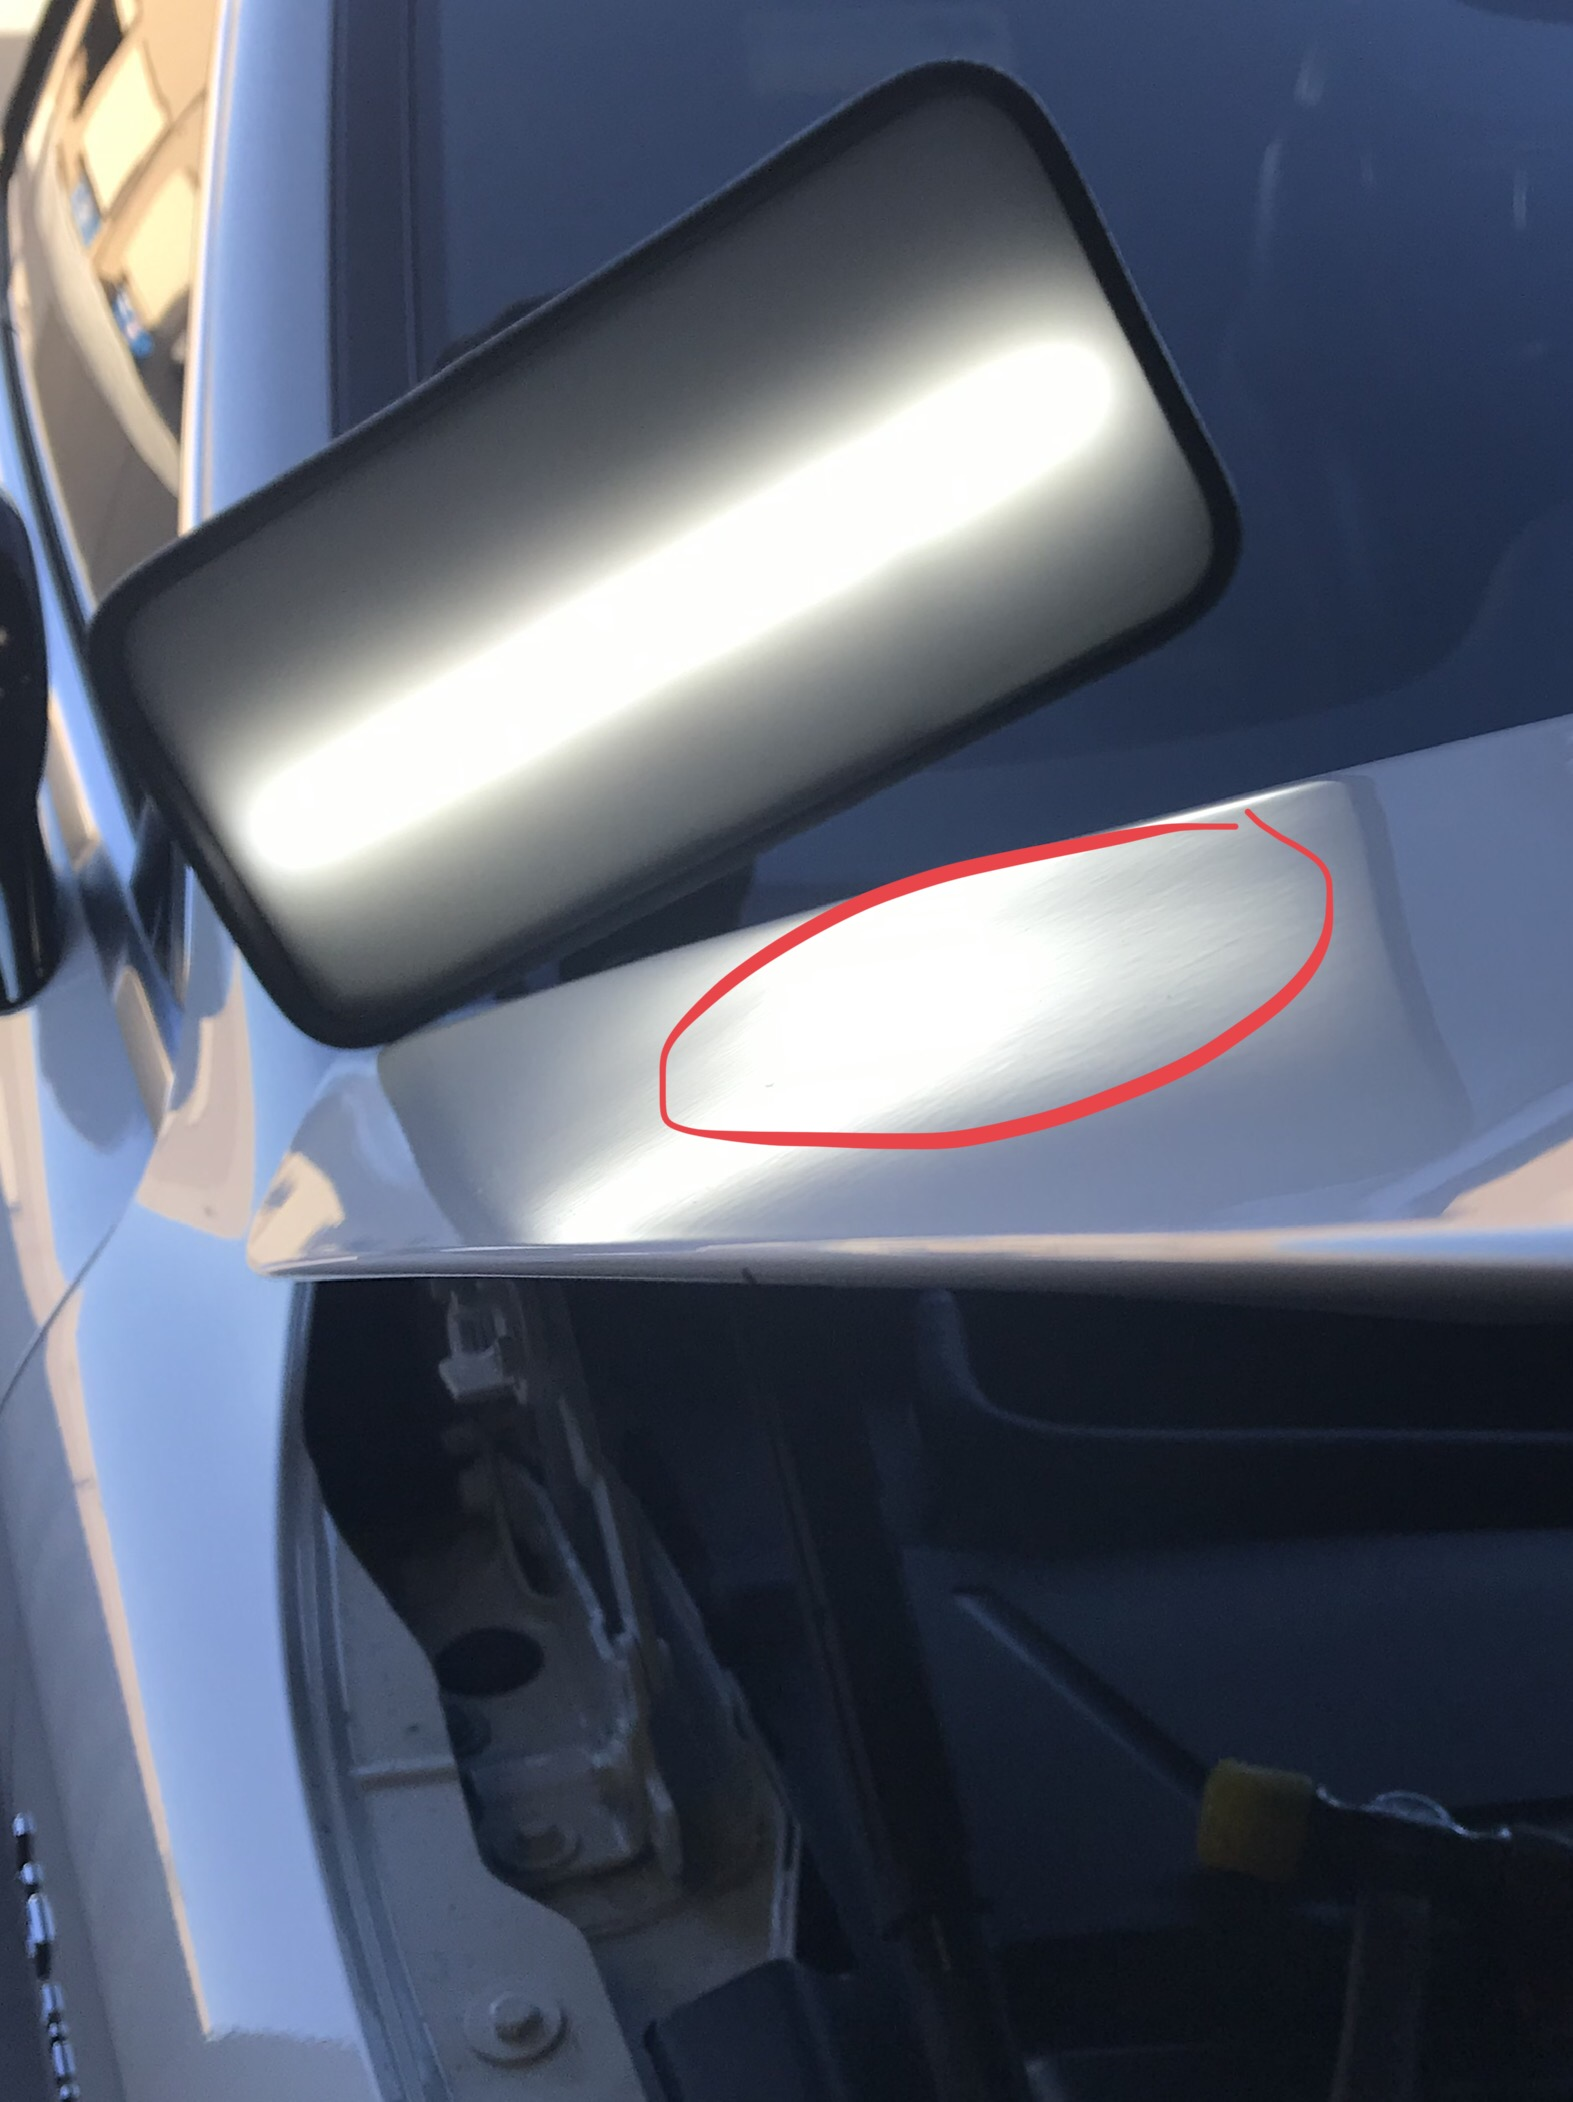 Mercedes CL 650 Dent Repair After